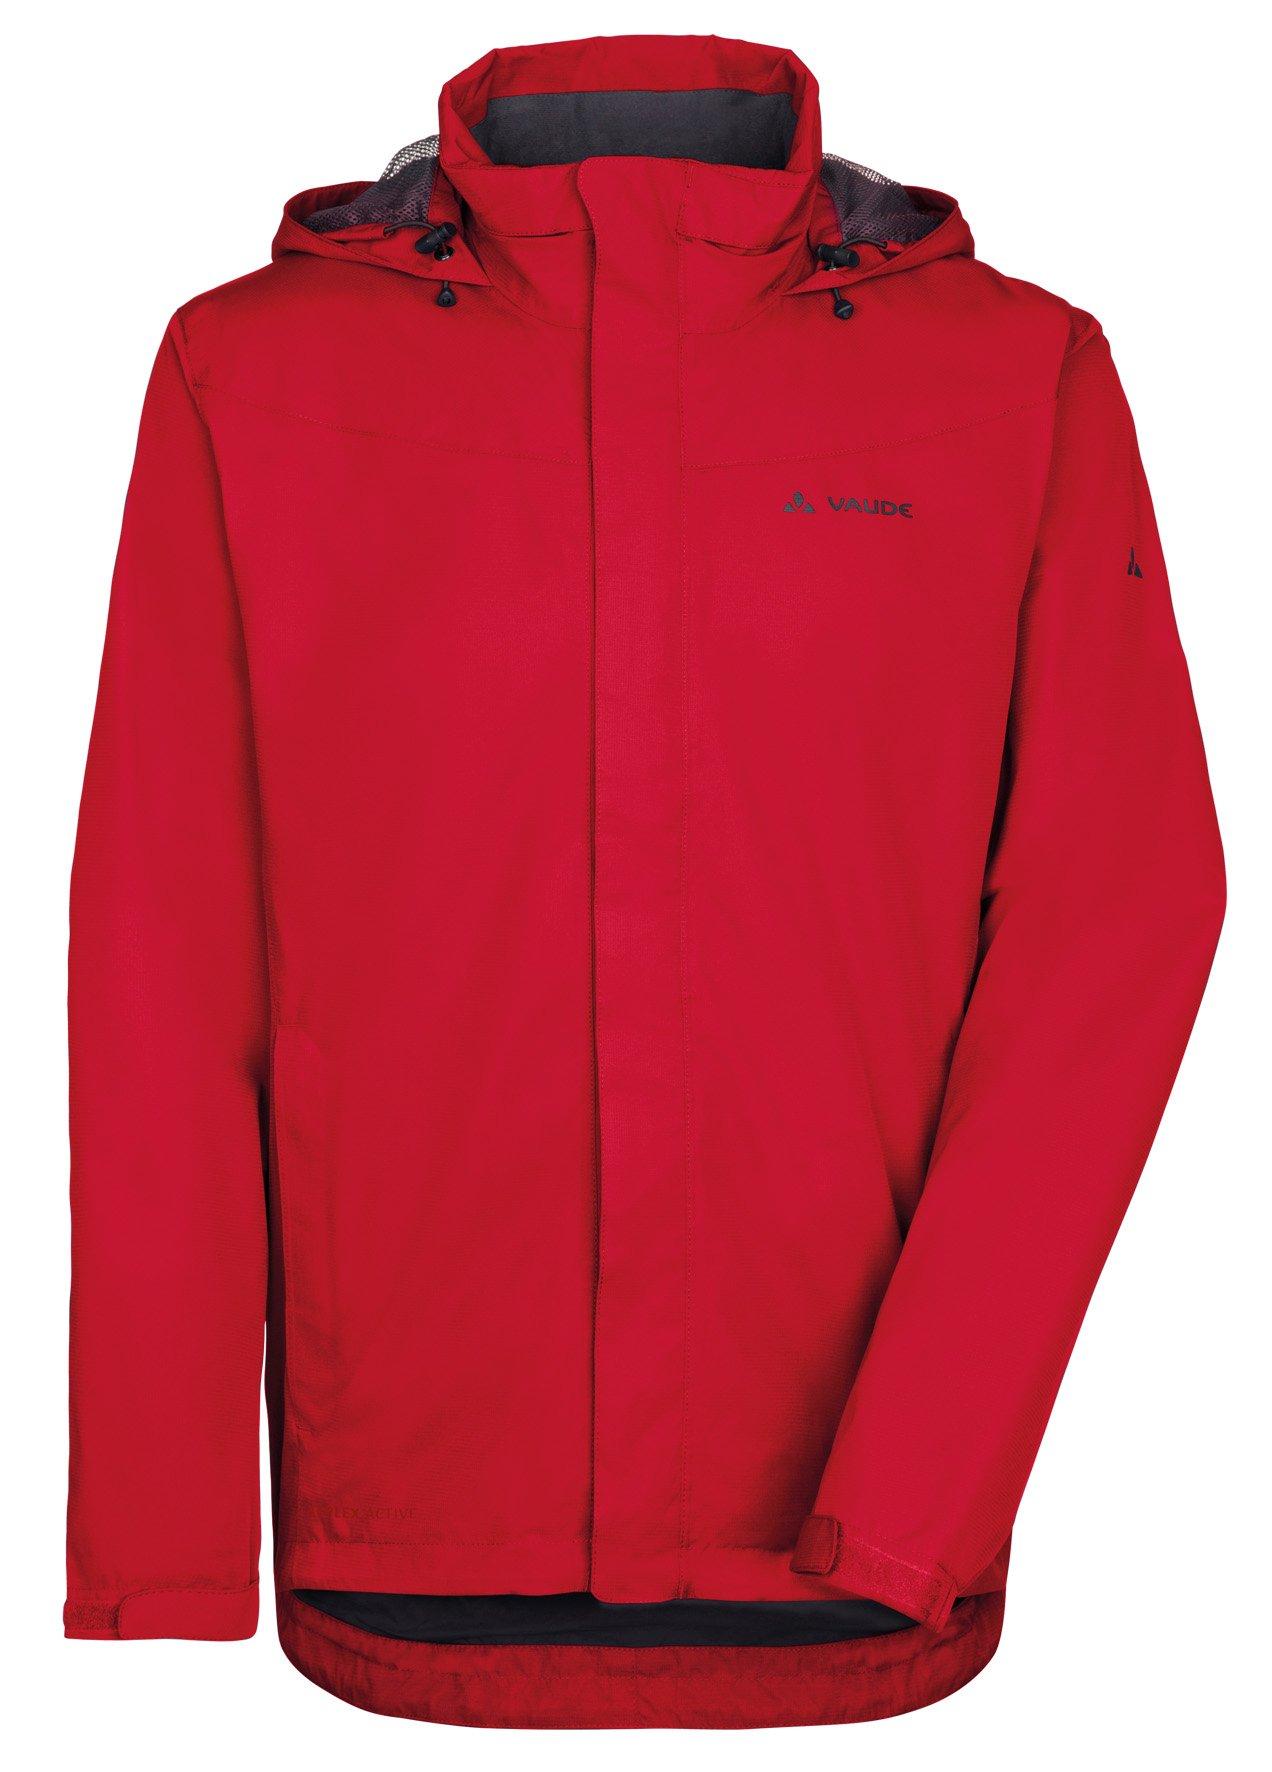 71TSWGqKnYL - VAUDE Men's Escape Bike Light Rain Jacket - 100% Polyester Lightweight Waterproof Jacket - Ideal Rai